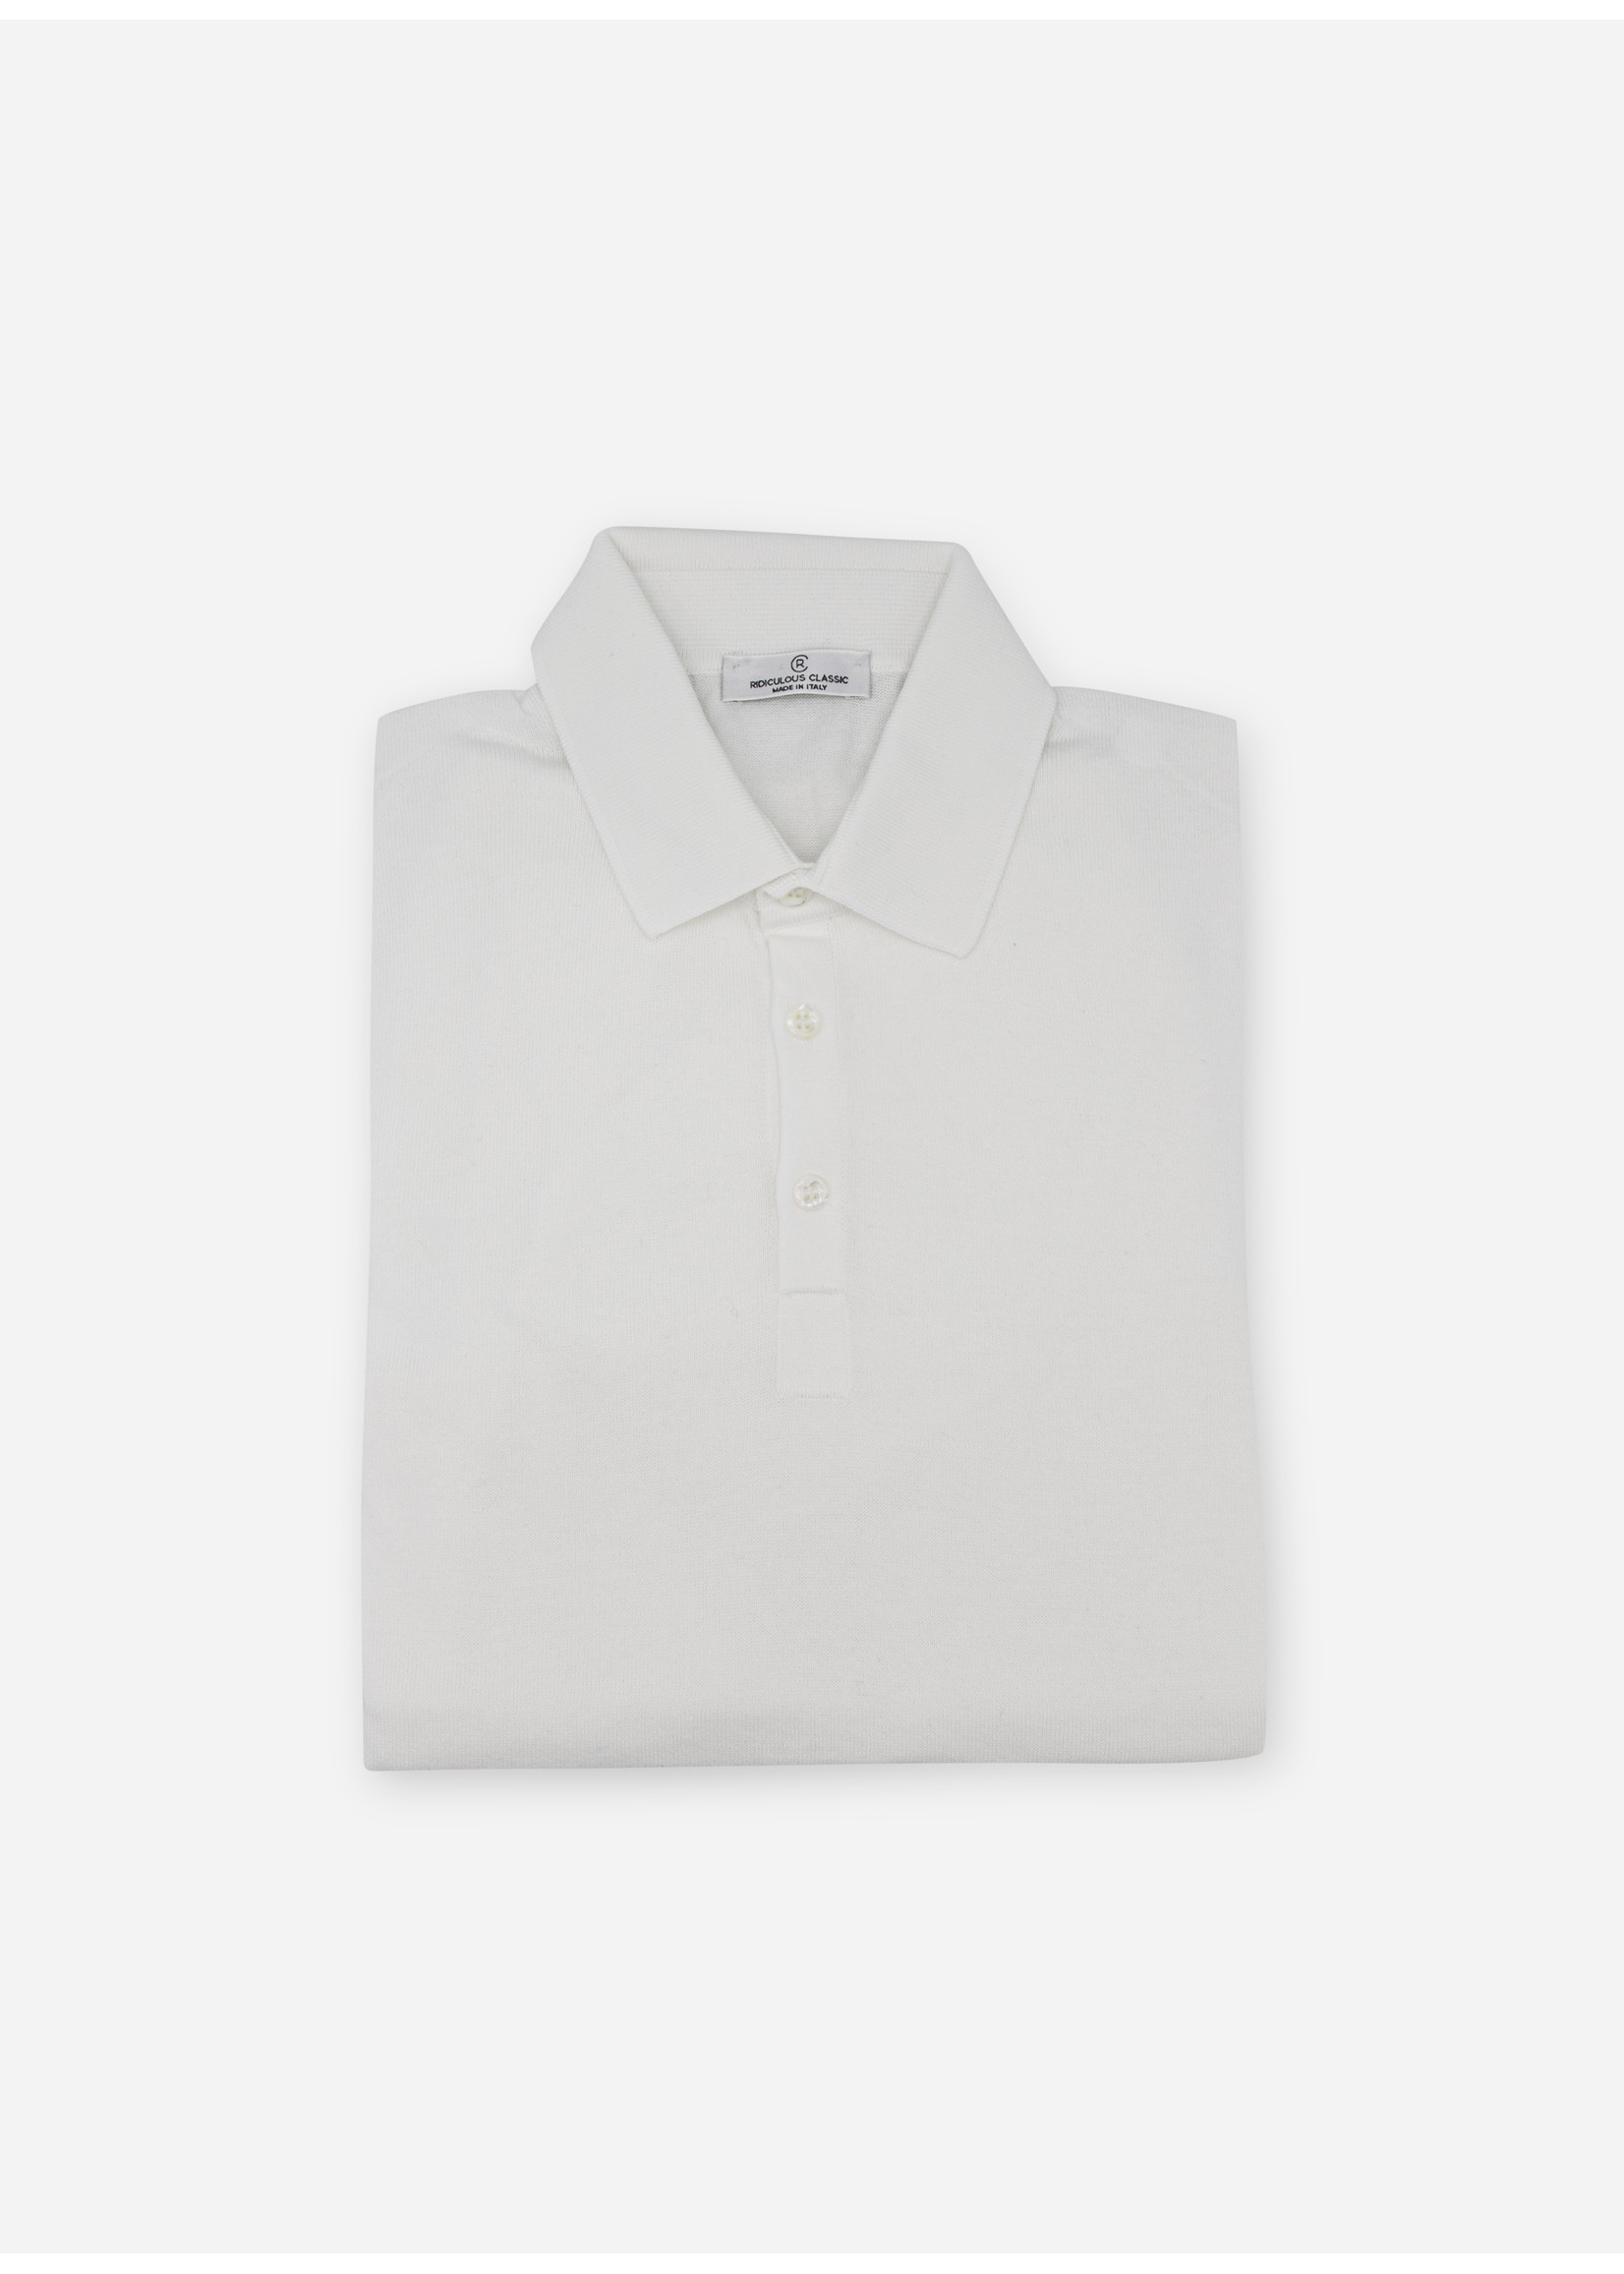 Ridiculous Classic Polo shirt white tennis